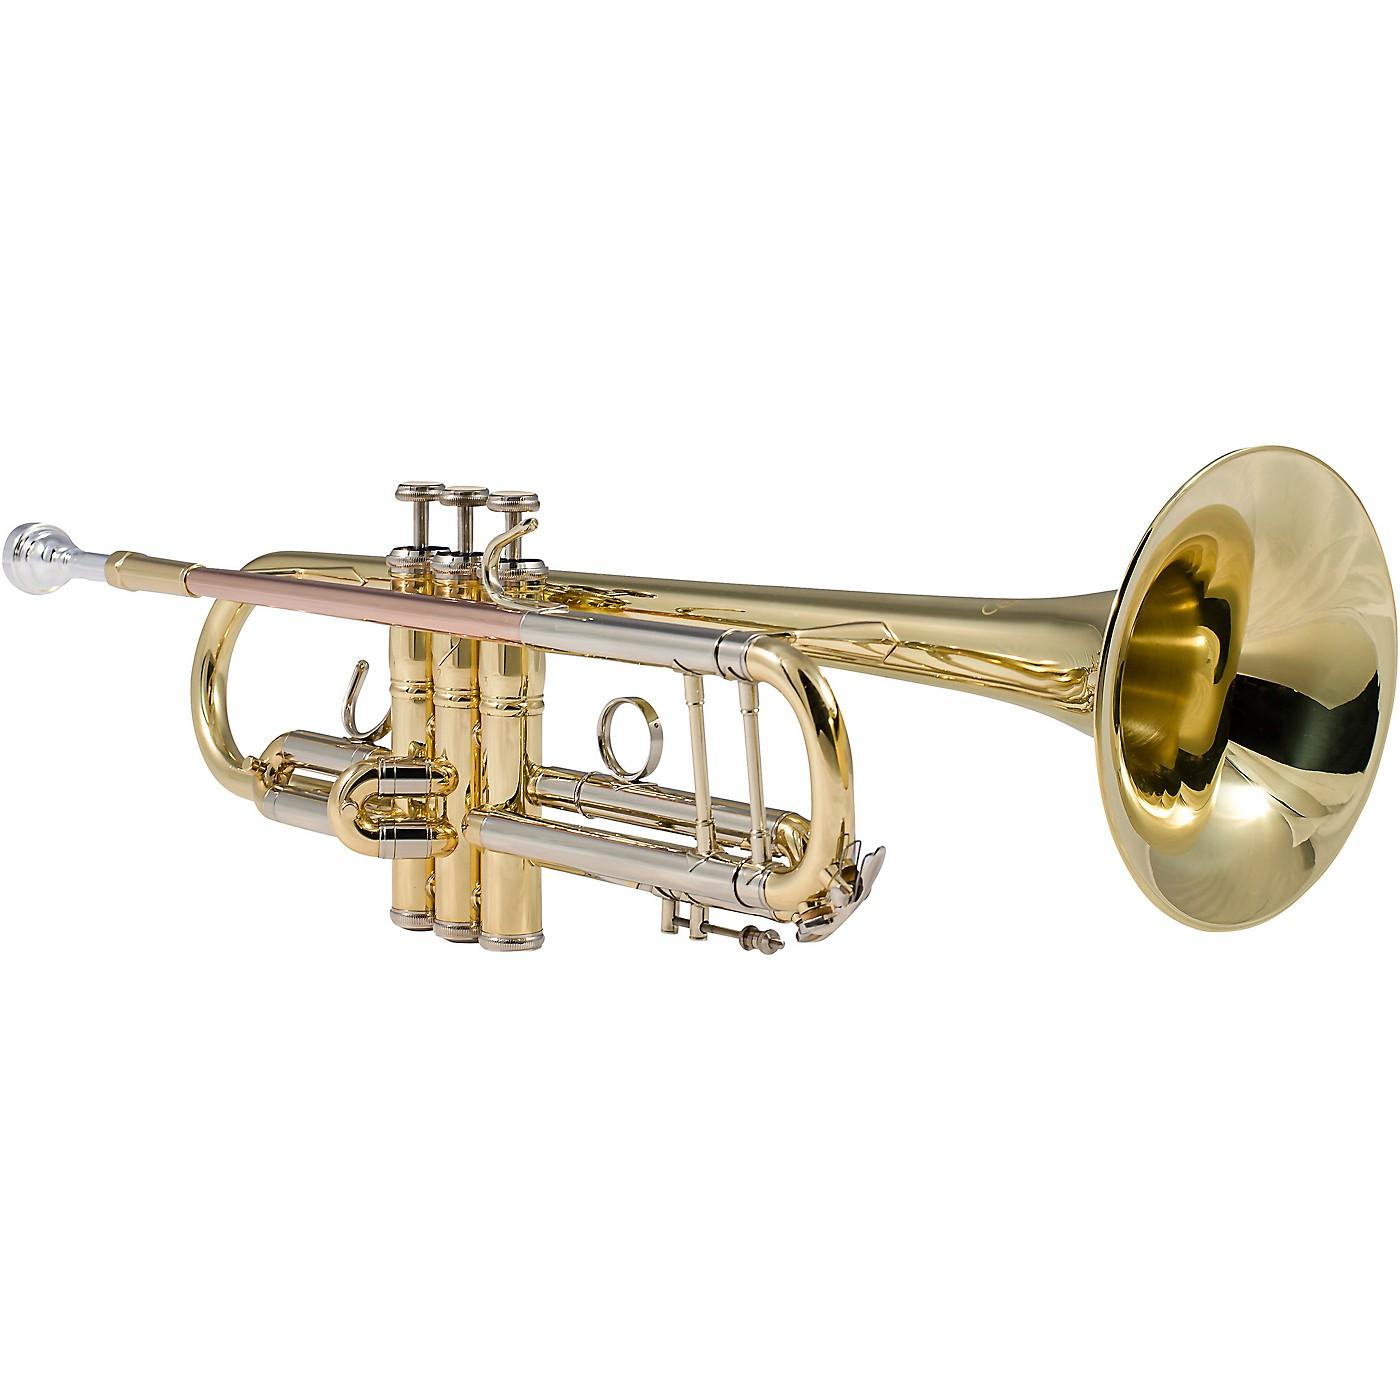 Etude ETR-200 Series Student Bb Trumpet thumbnail